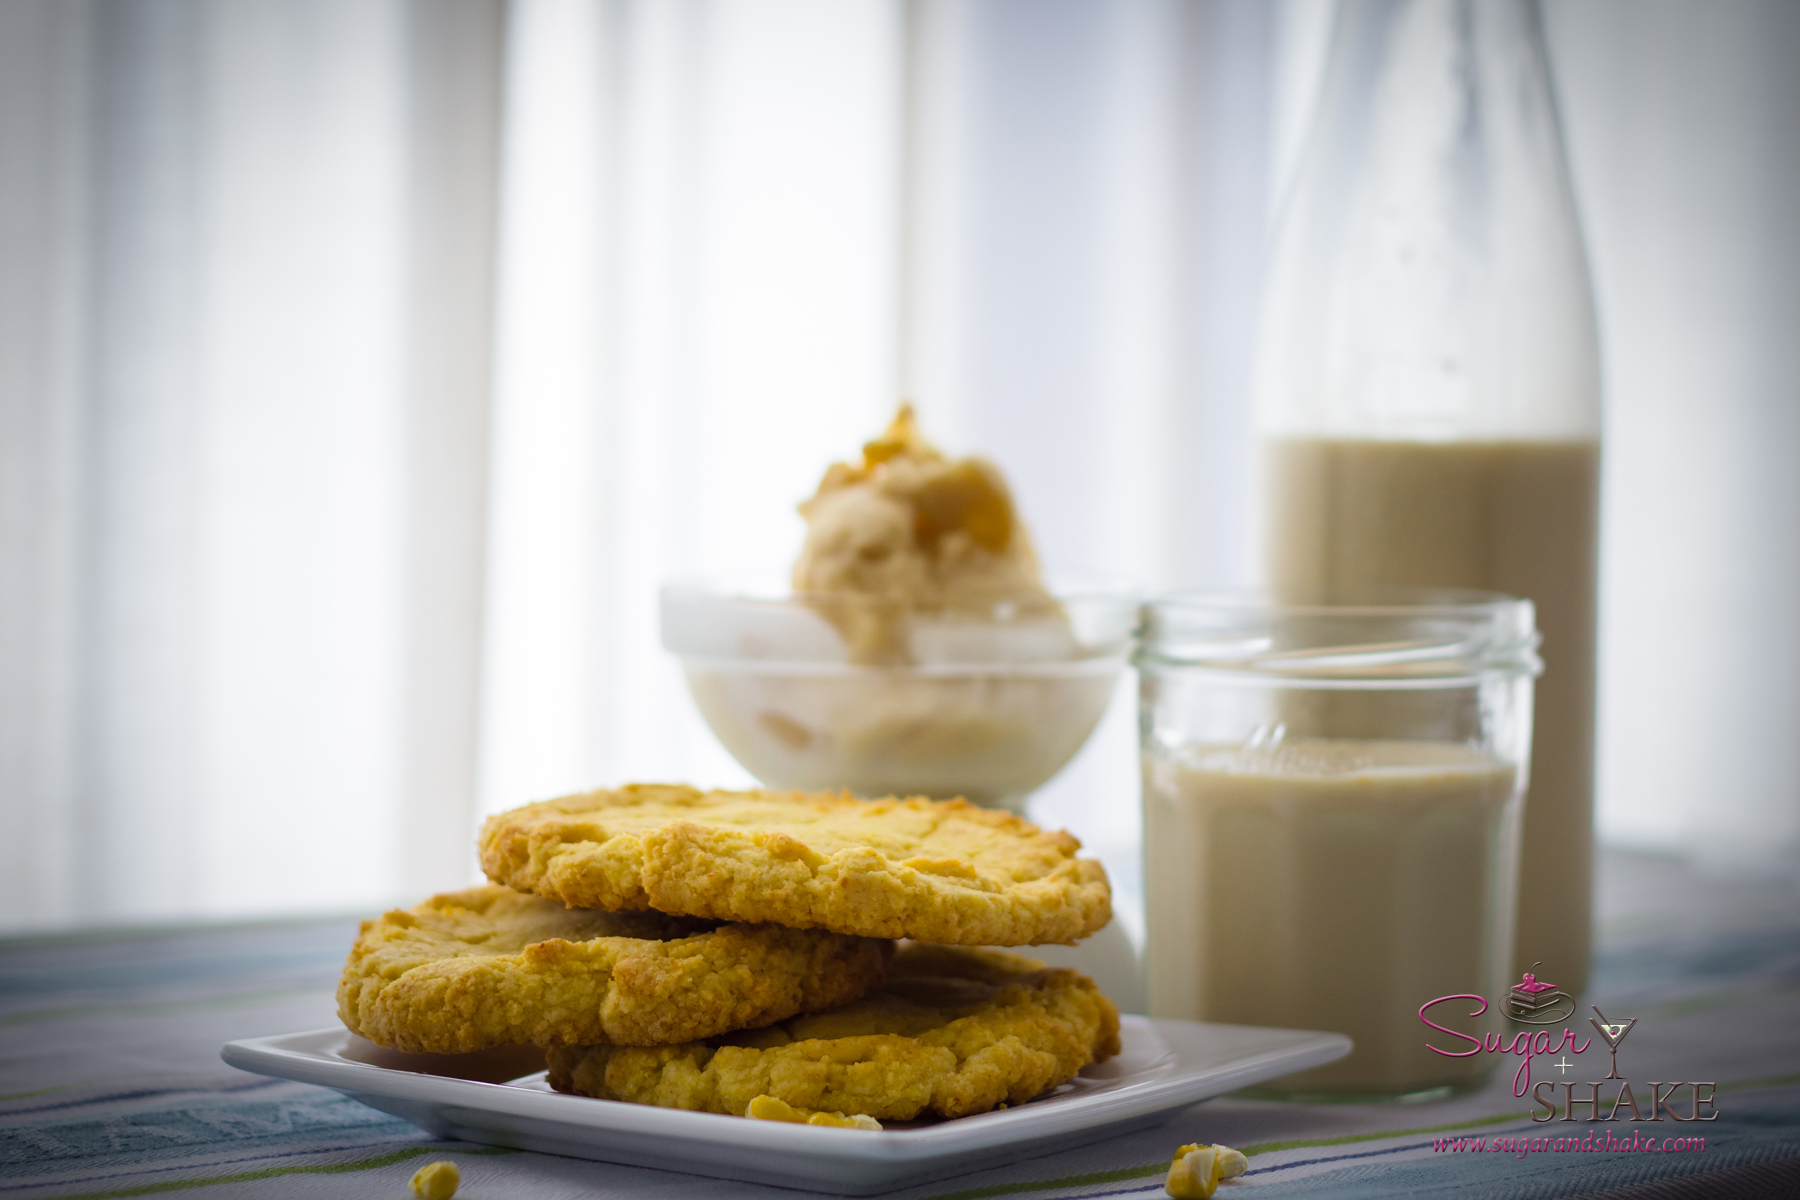 A Momofuku Milk Bar spread: Corn Cookies, Cereal Milk Ice Cream and cold Cereal Milk. © 2013 Sugar + Shake